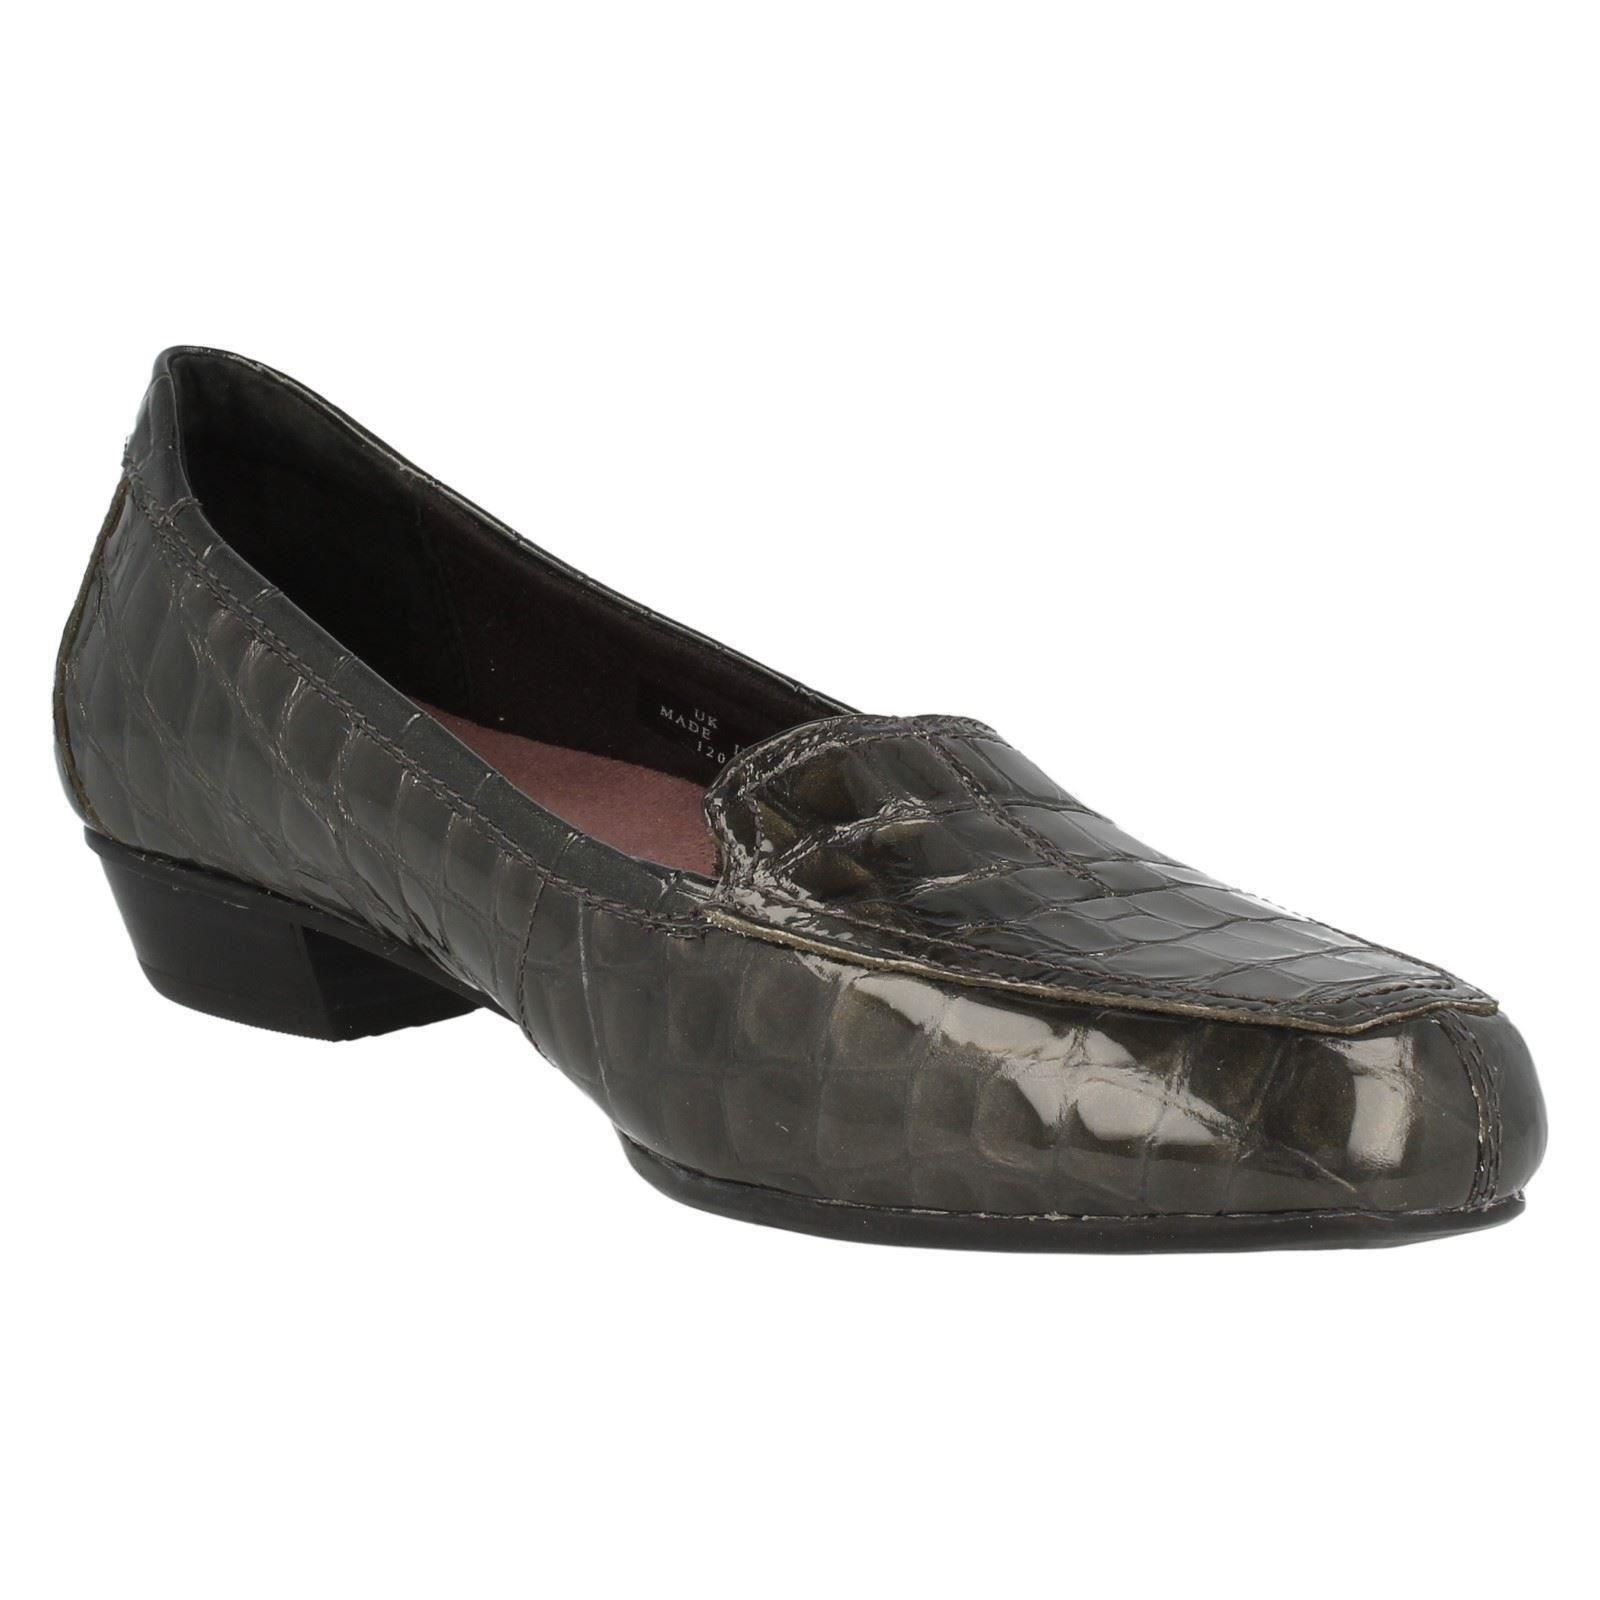 Clarks Ladies Evening Shoes